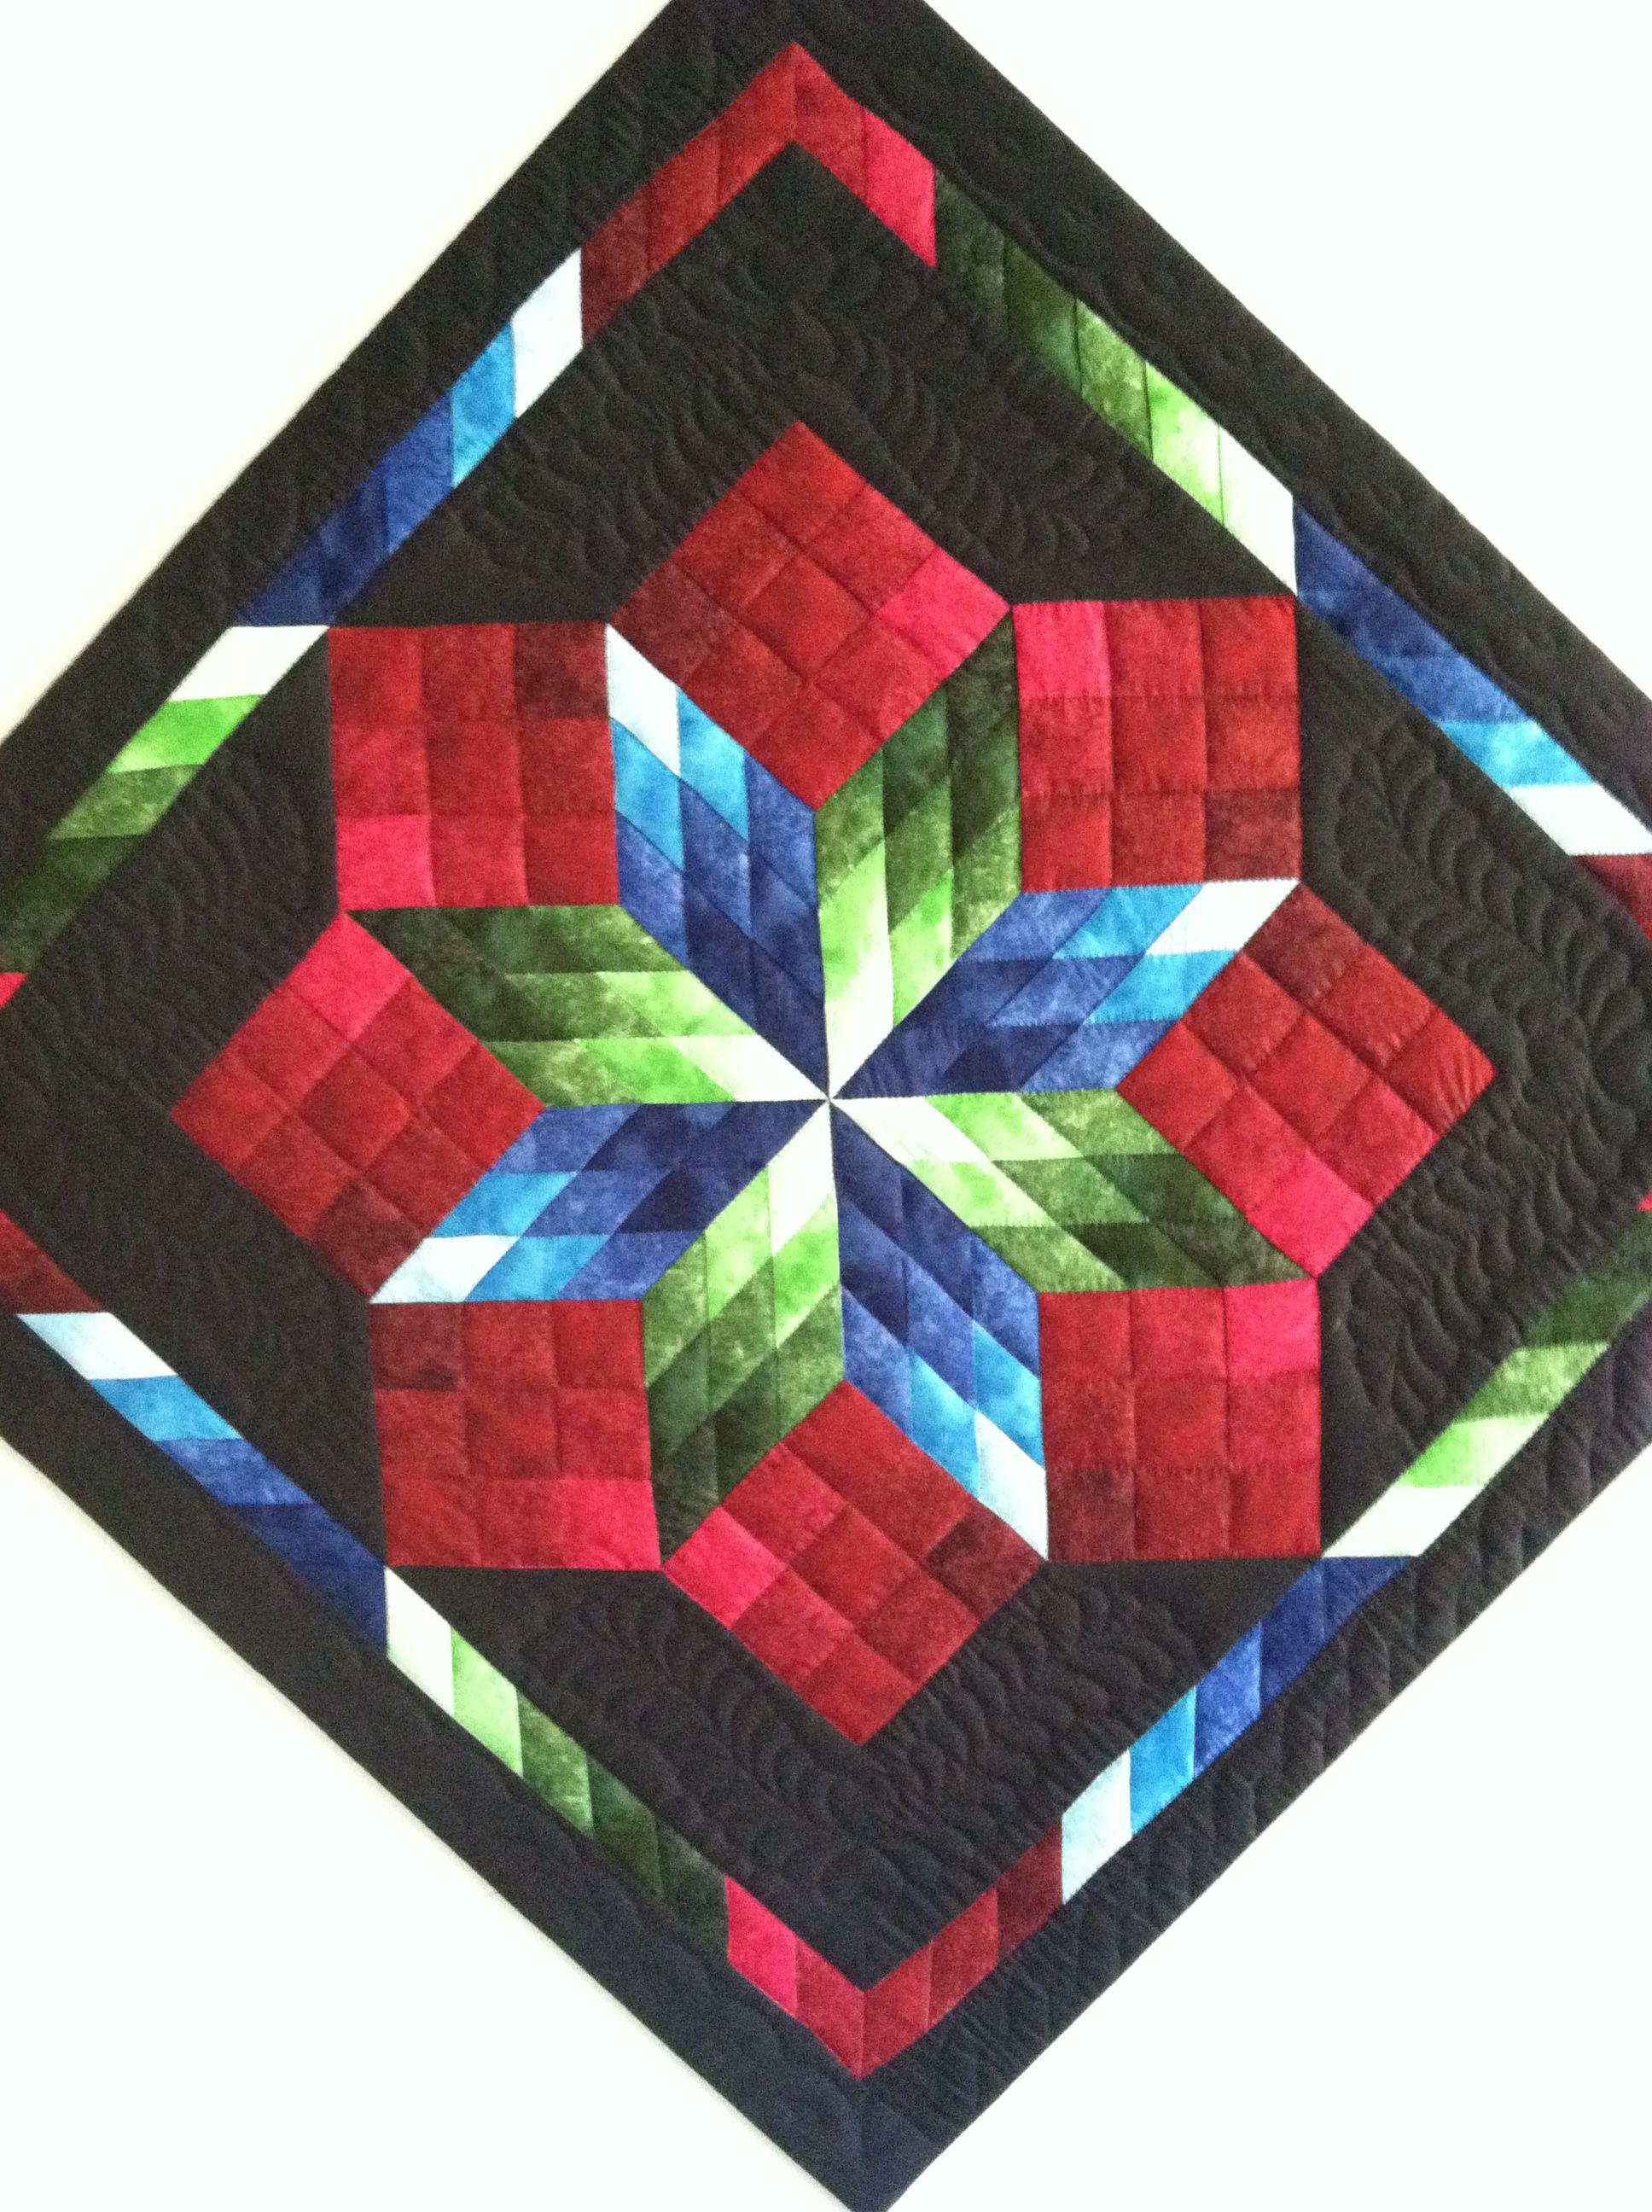 Amish wall hanging quilt | Quiltausstellungen | Pinterest ... : amish quilt wall hangings - Adamdwight.com